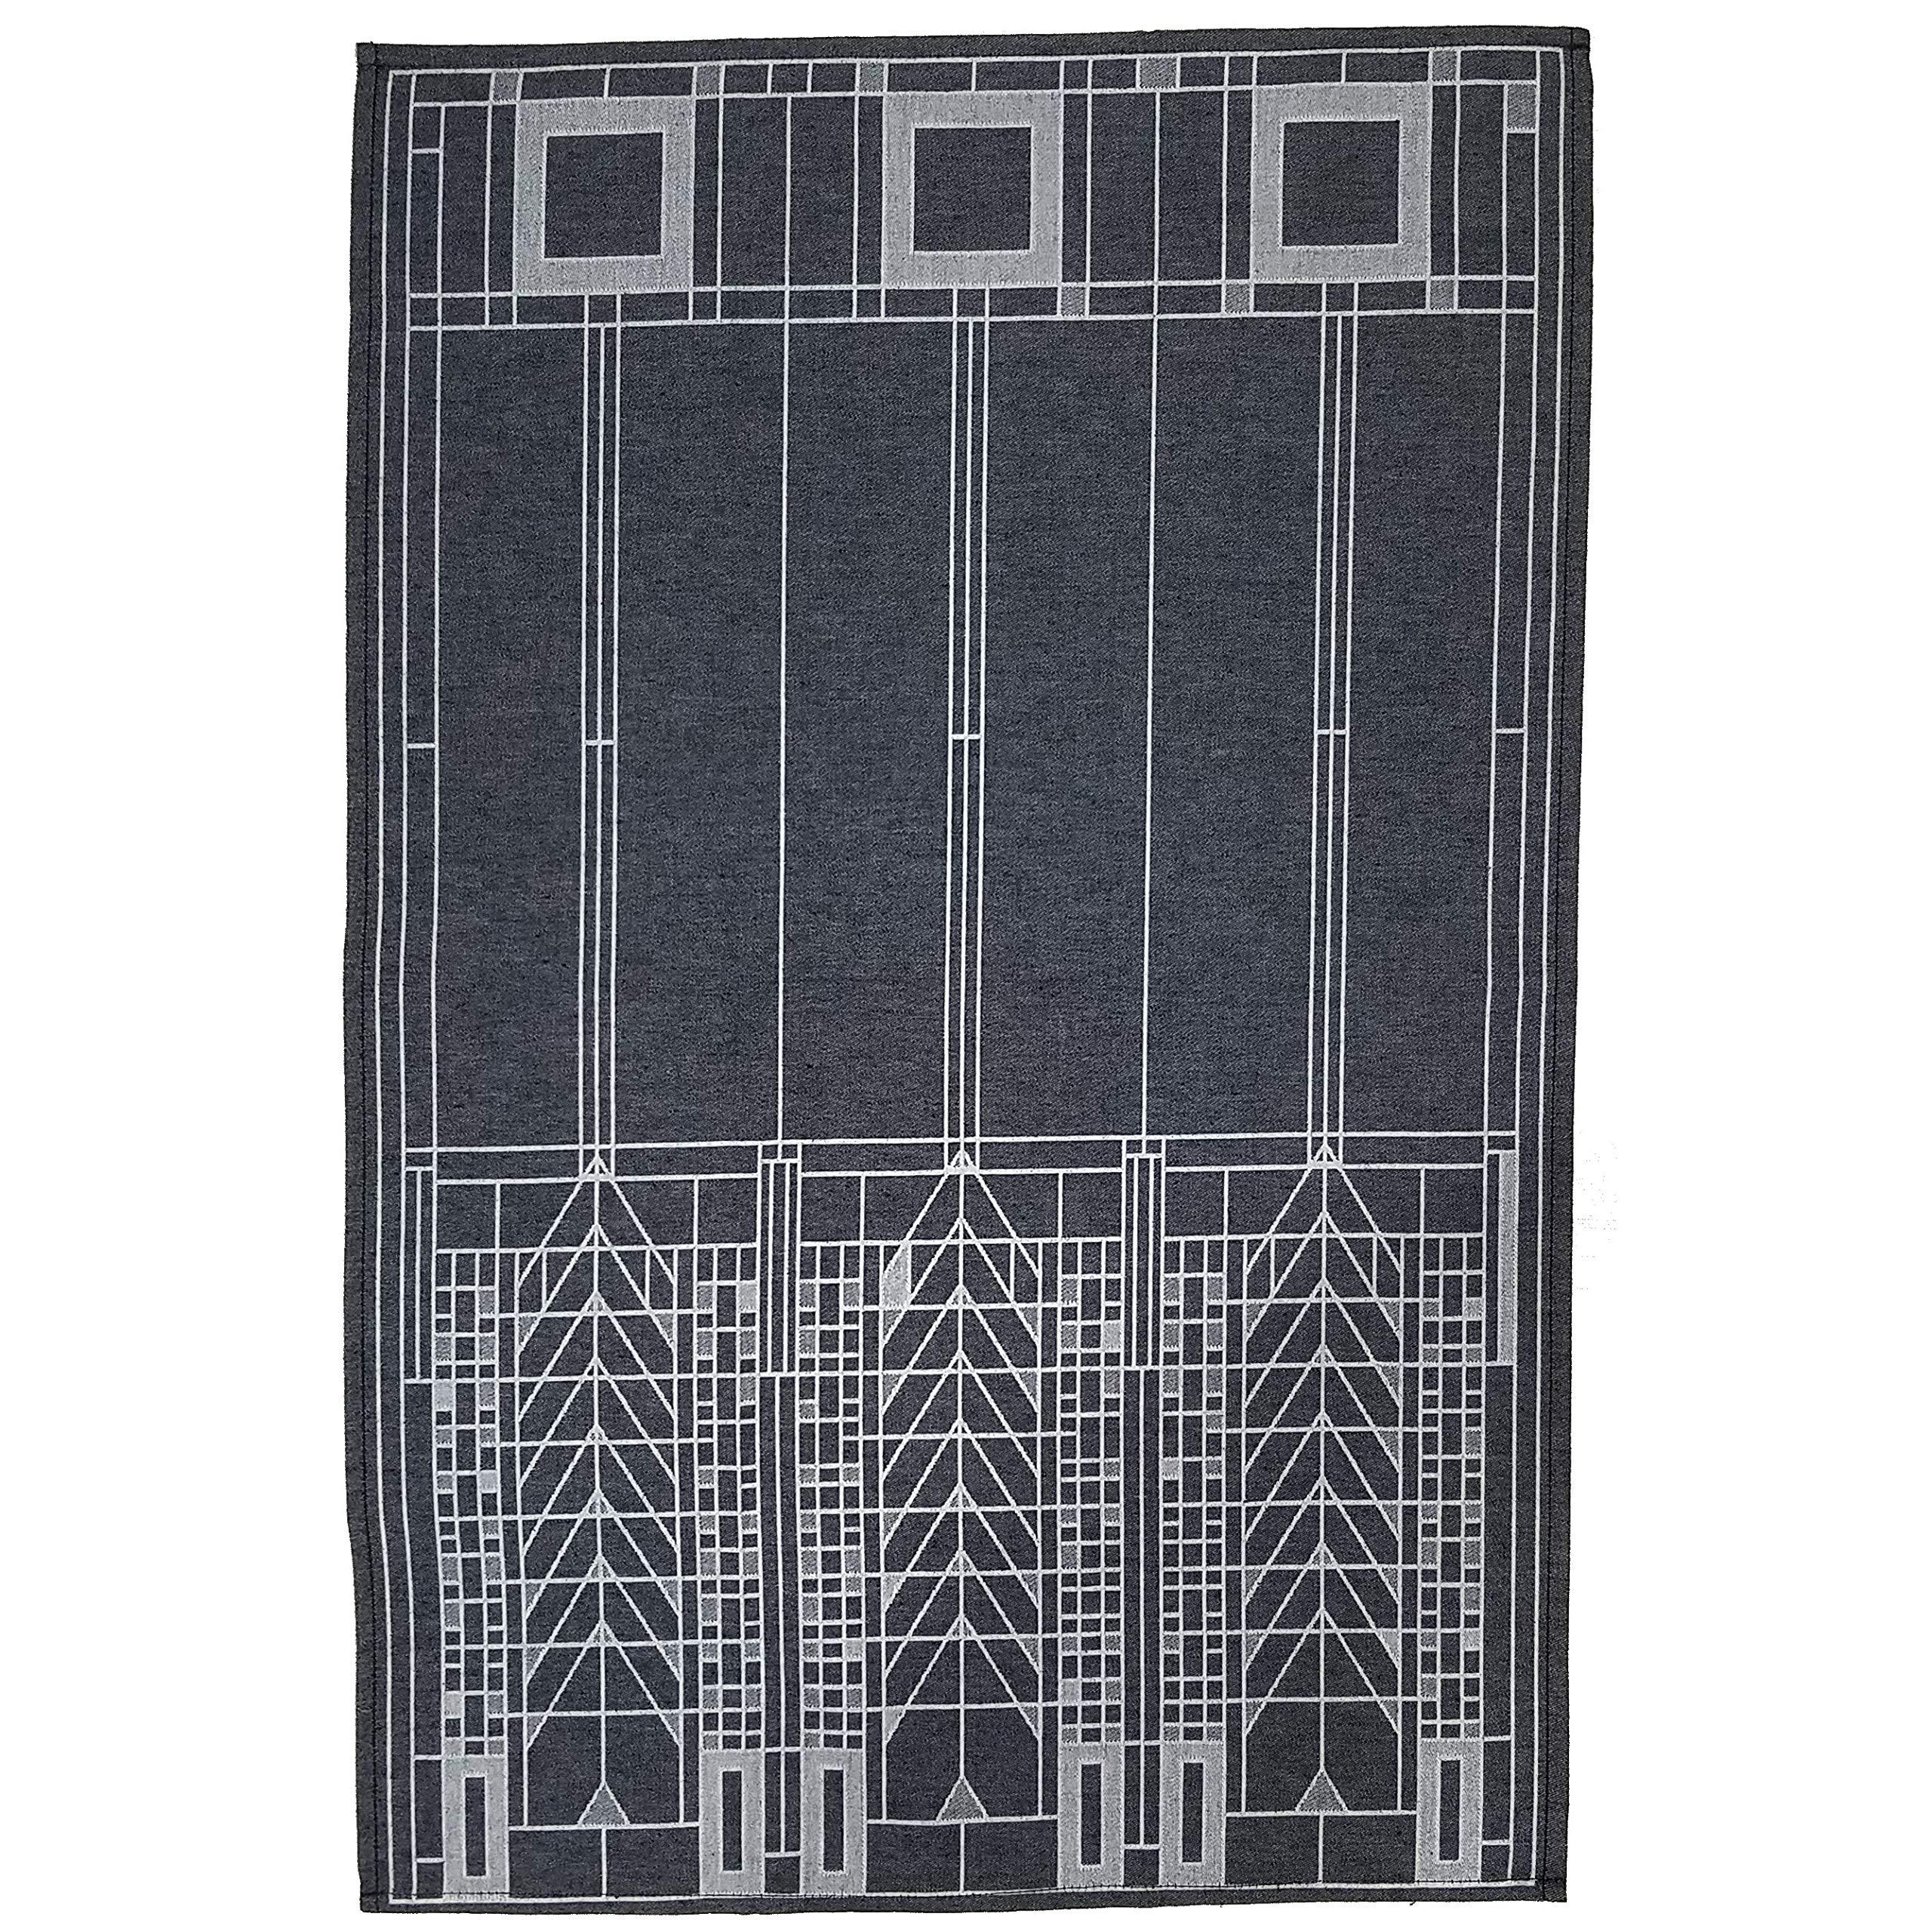 KAF Home Frank Lloyd Wright Woven Jacquard Tea Towel 20 x 30-inch 100-Percent Cotton (Tree of Life) by KAF Home (Image #4)